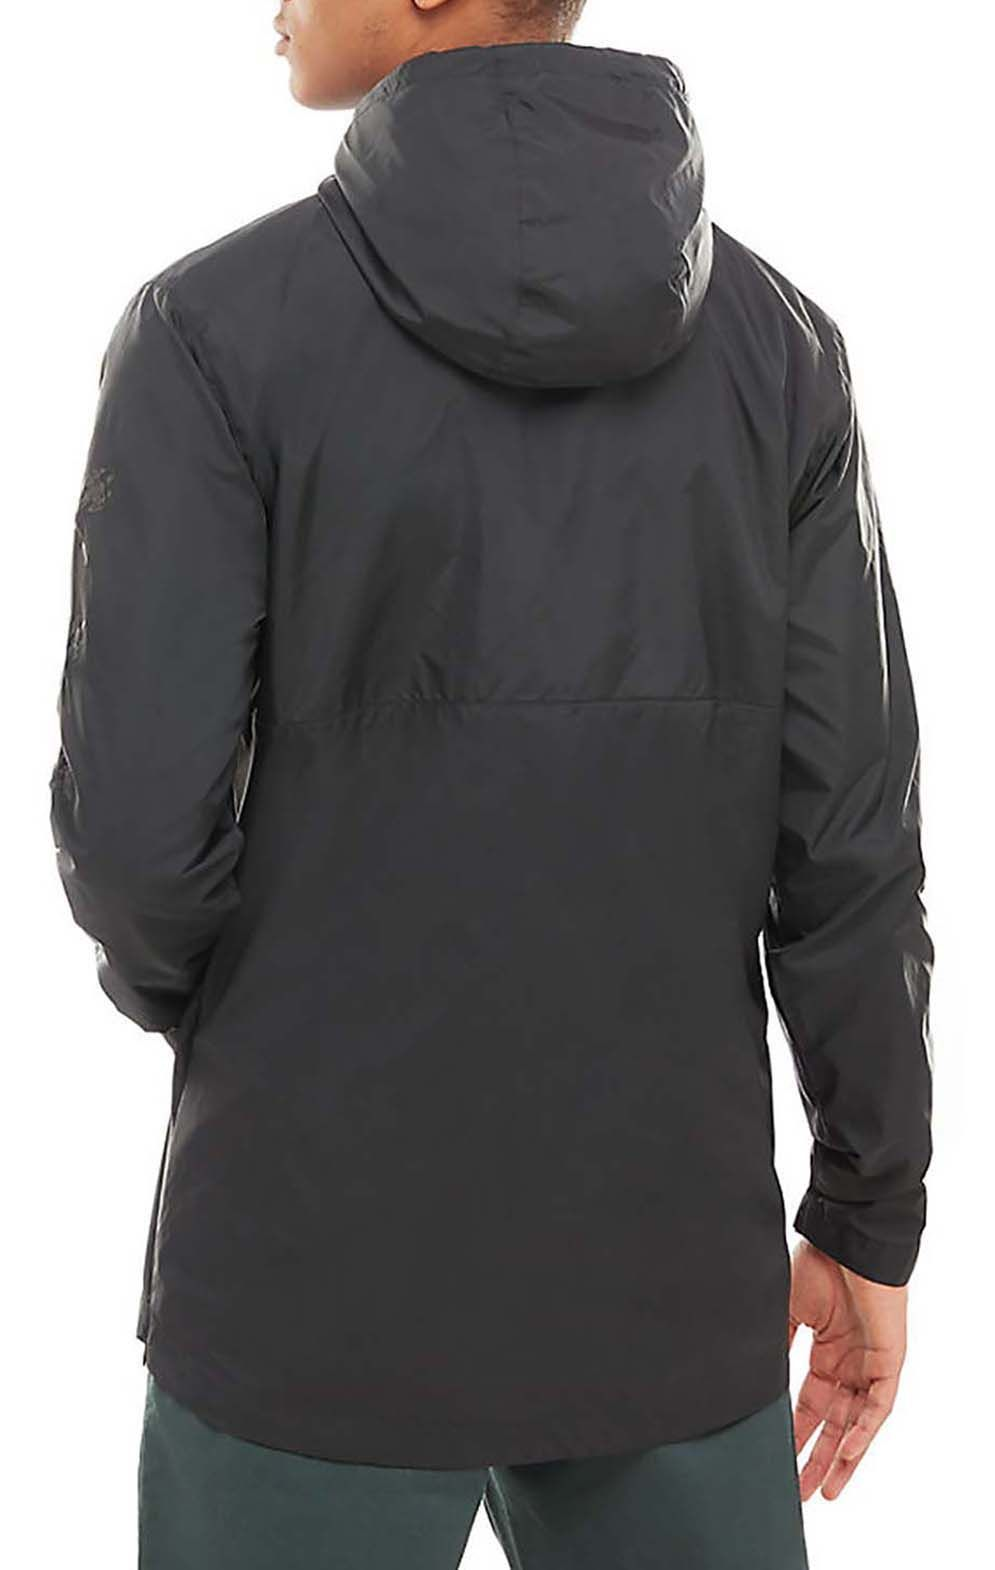 Vans Jacket STONERIDGE ANORAK Black (Trujillo)